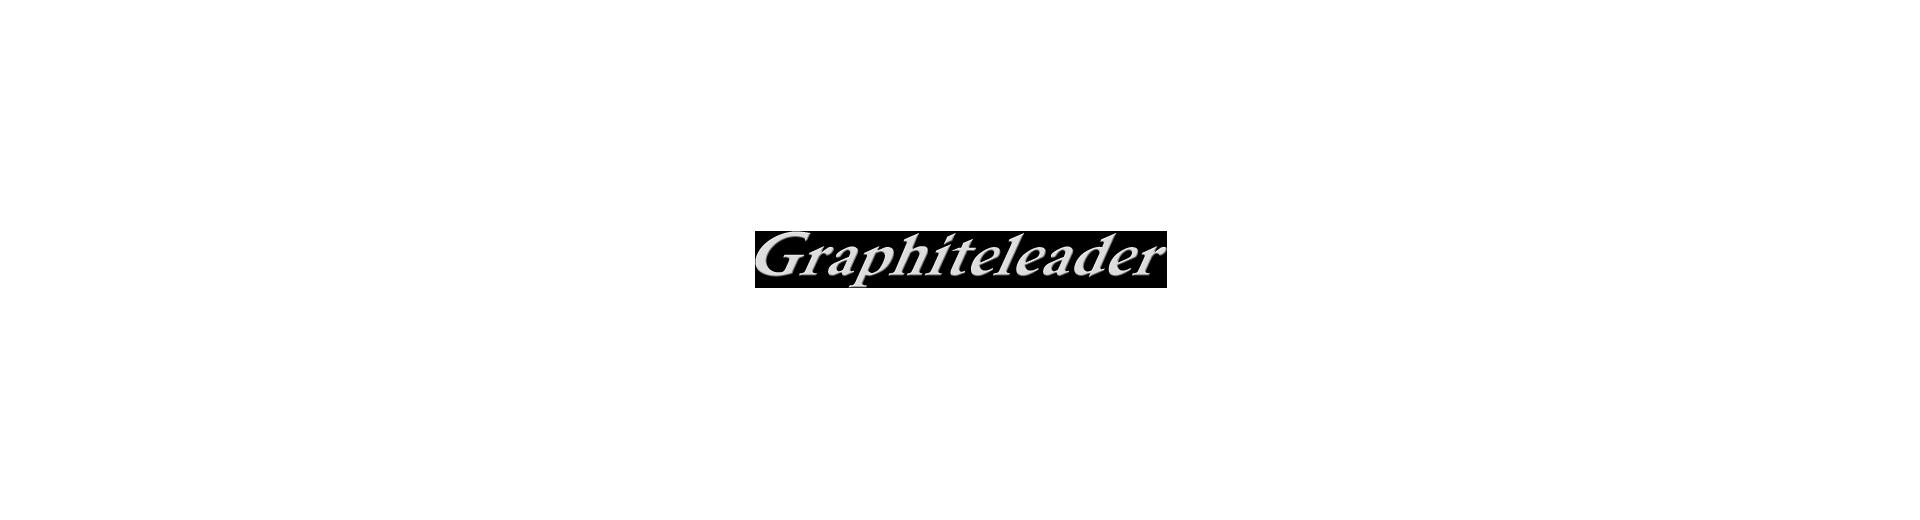 Graphite leader